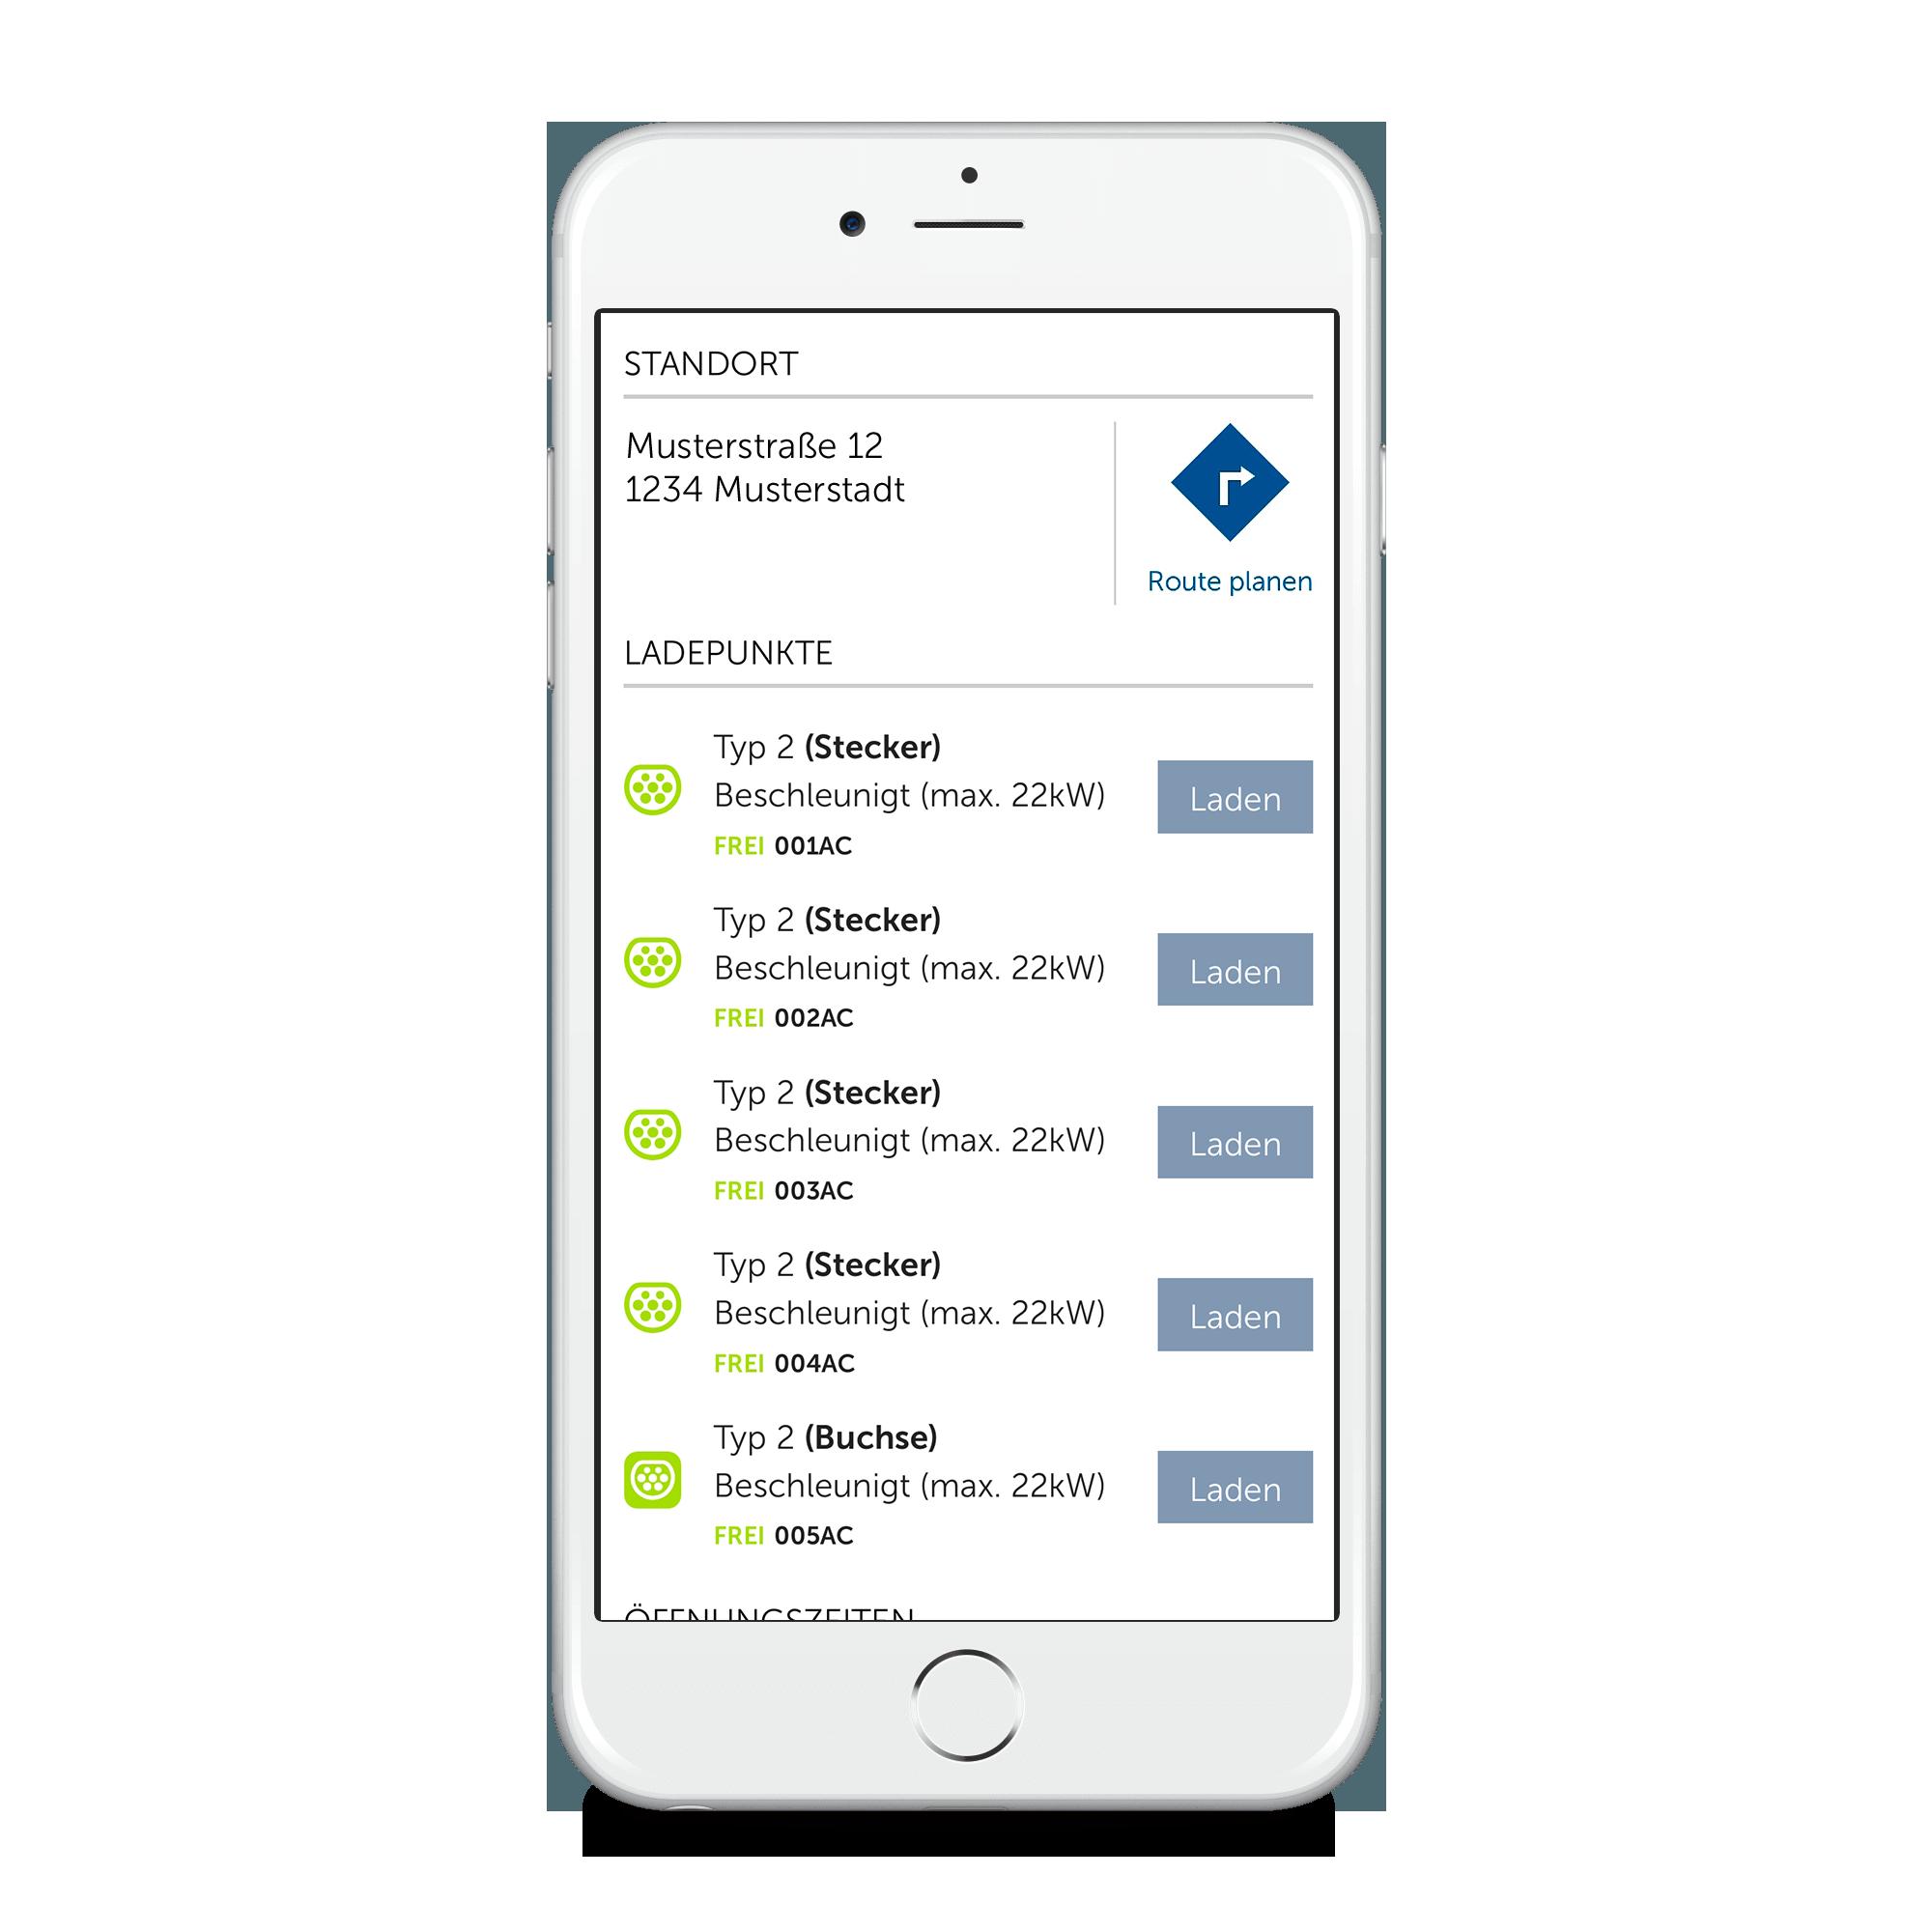 whitelabel smartphone app